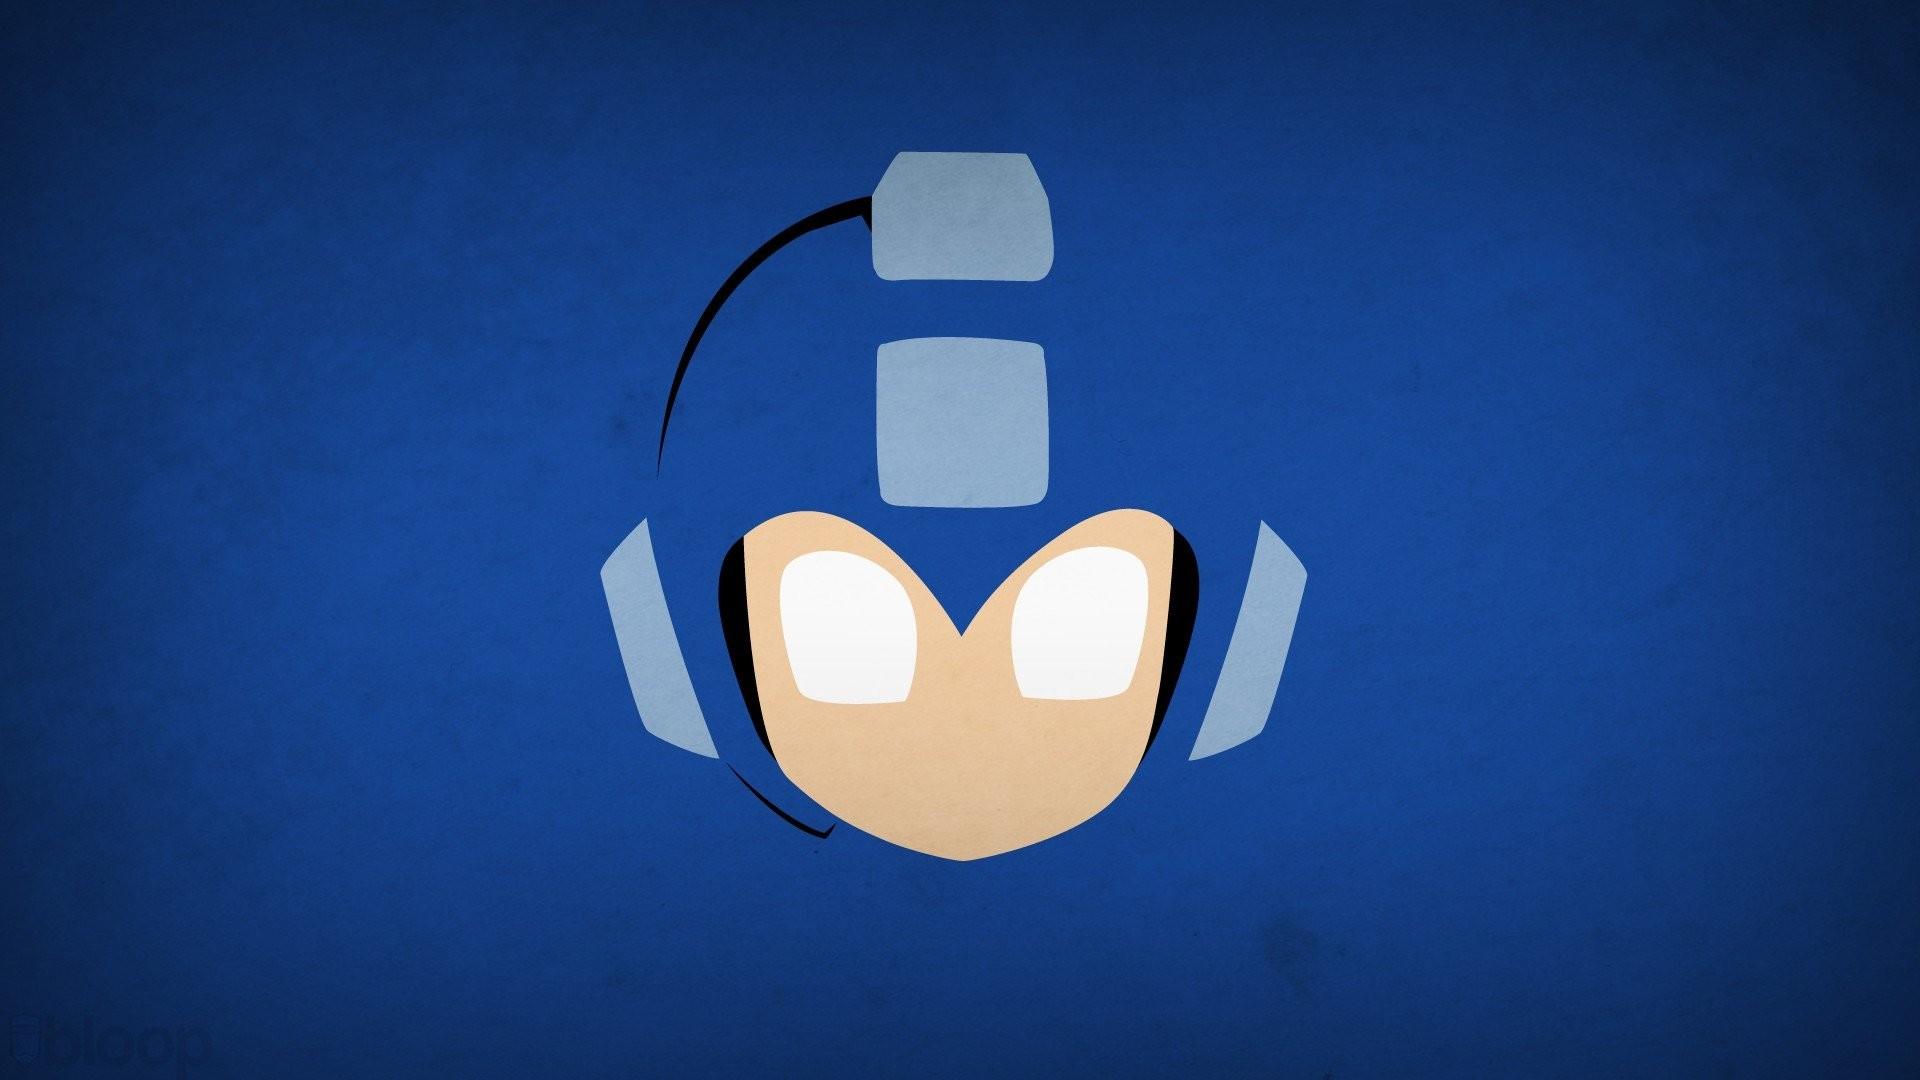 Blo0p Blue Background Mega Man Minimalistic Superheroes Video Games · mega  man megaman zero